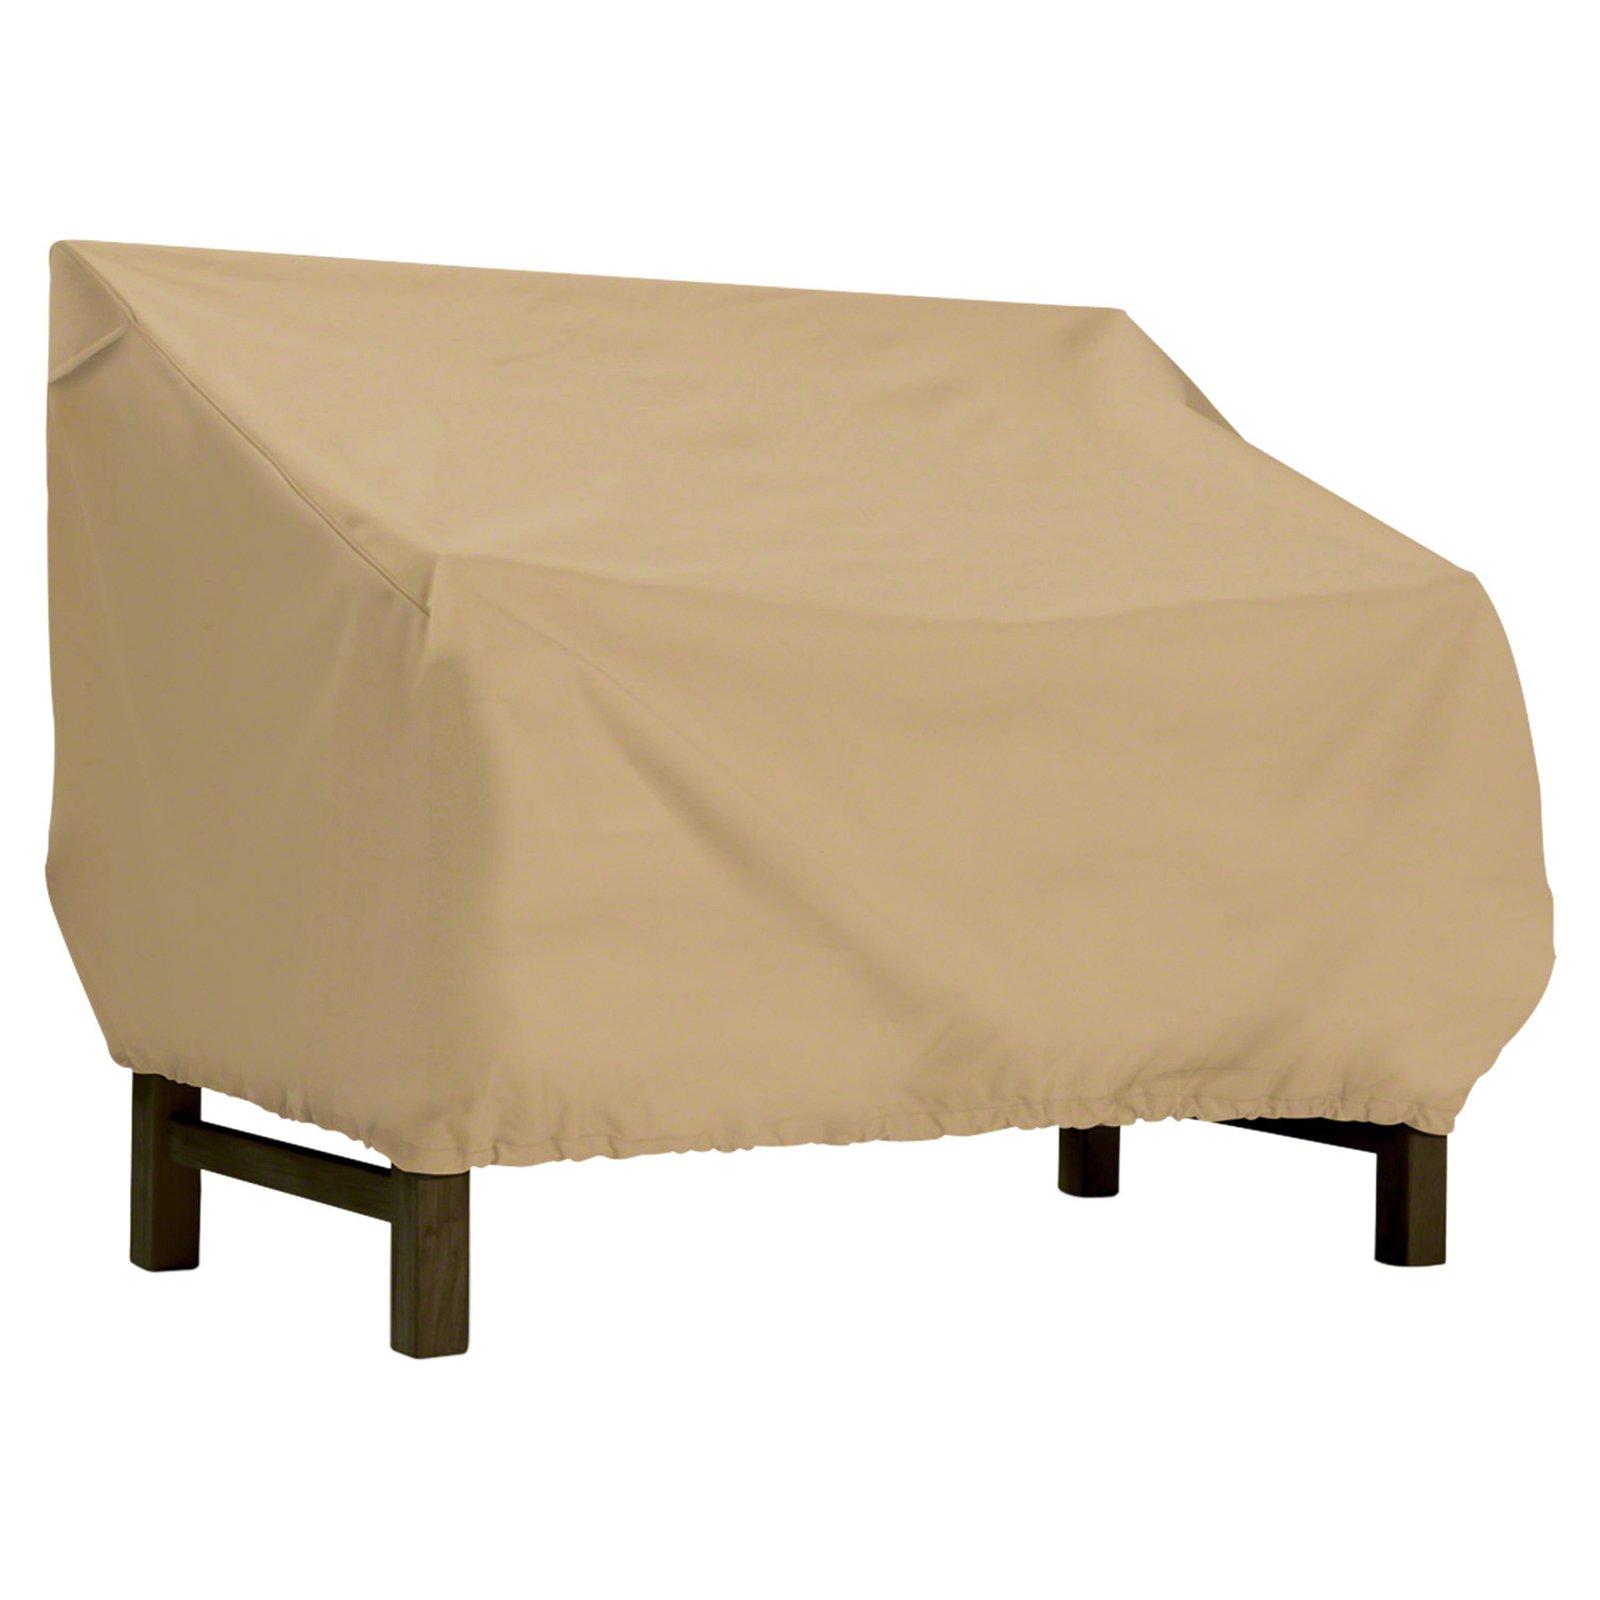 Classic Accessories Terrazzo Patio Bench Loveseat Cover Patio Furniture Covers Loveseat Covers Furniture Loveseat